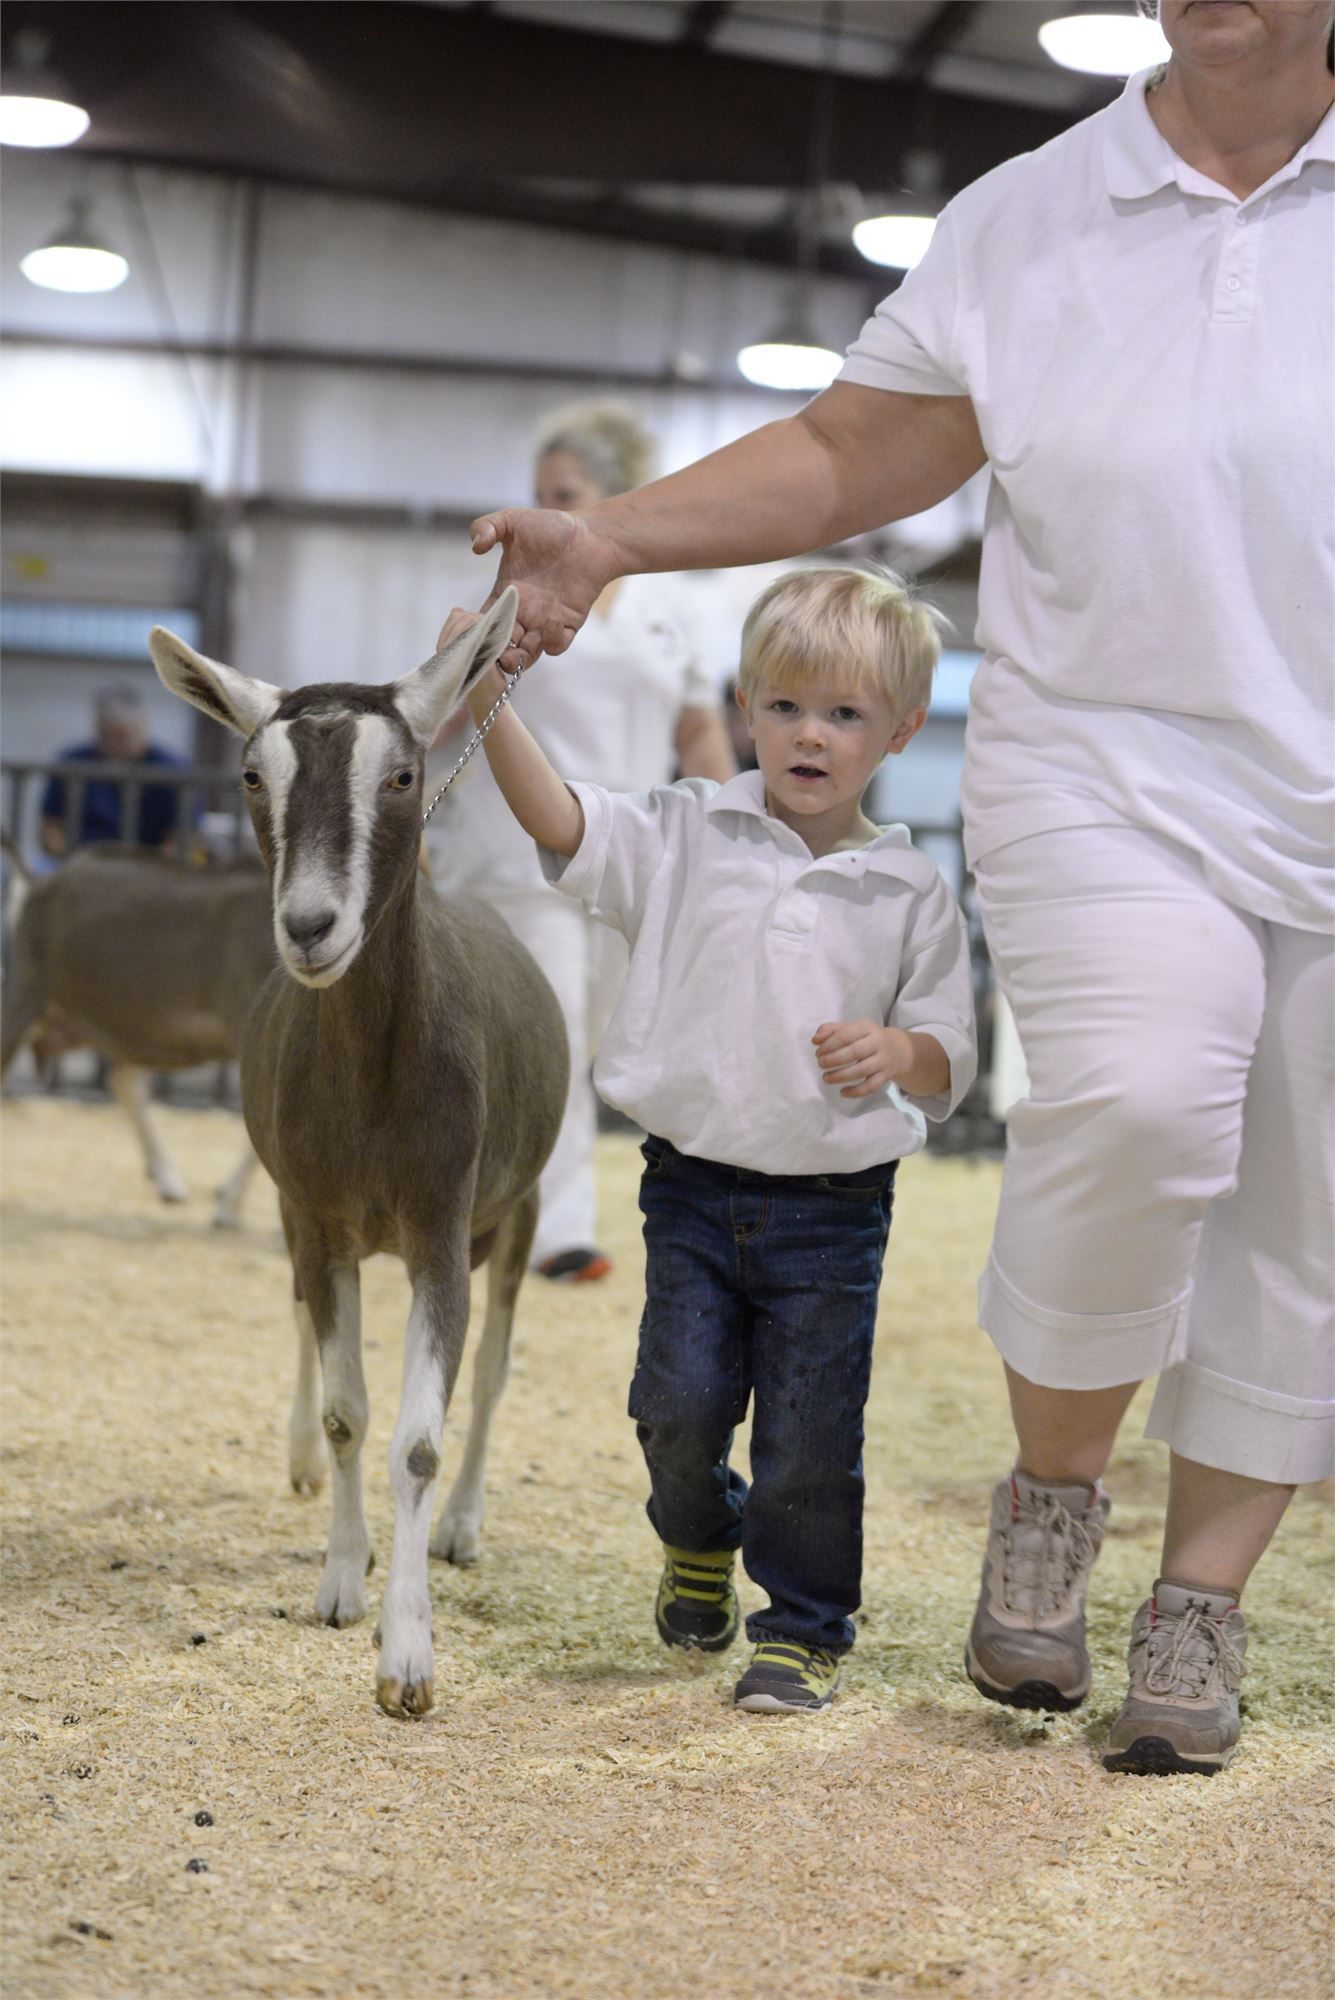 goat, halter, little boy, blue jeans, lady in white